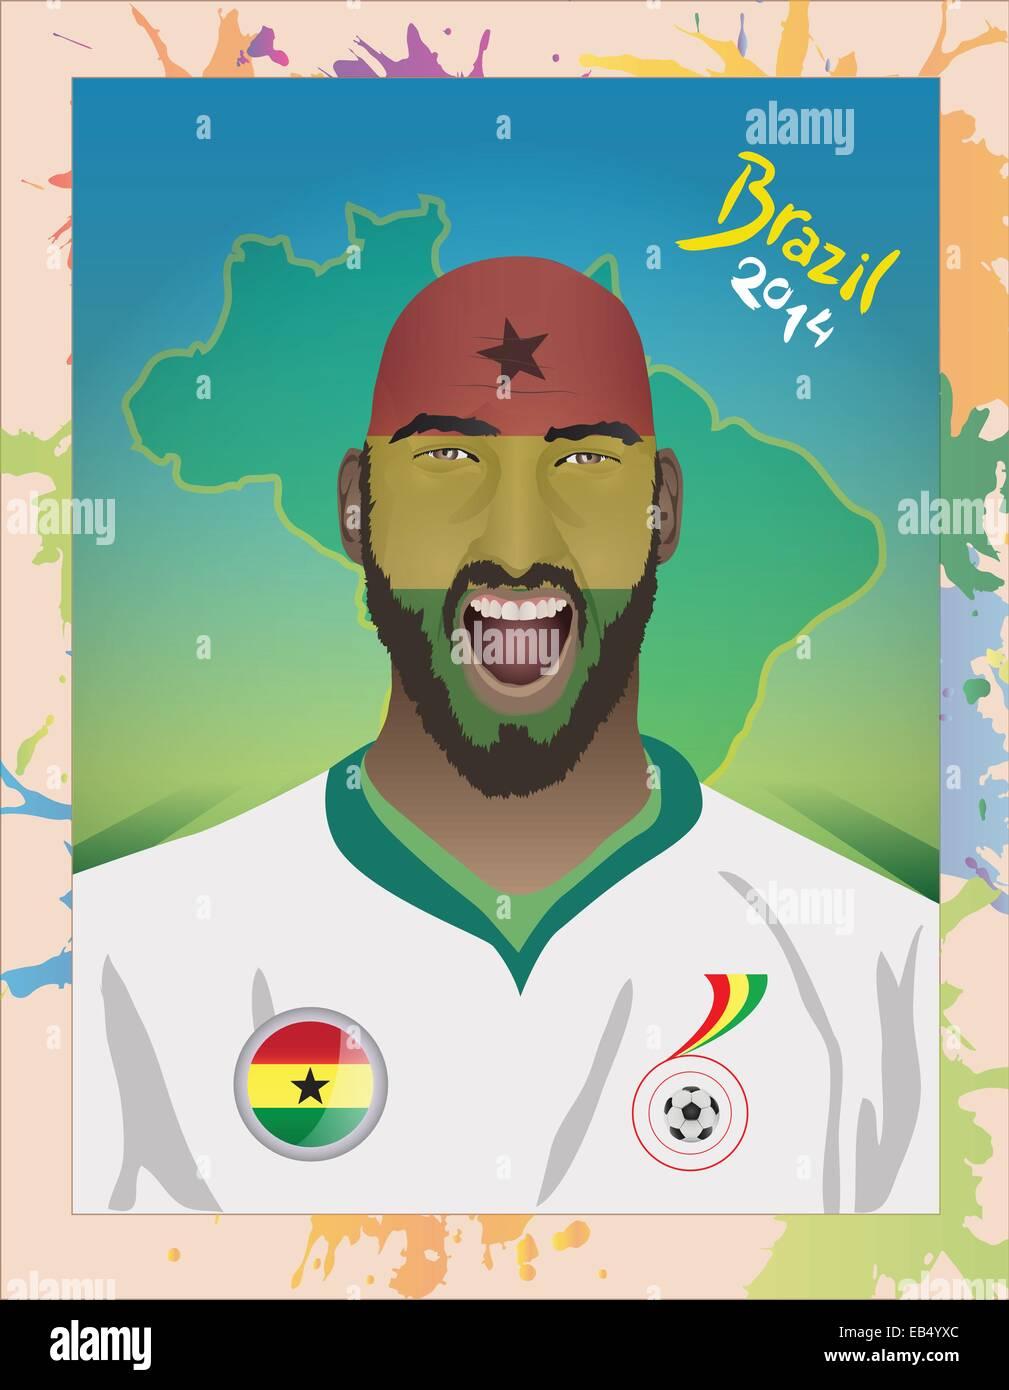 Ghana football fan shouting - Stock Vector